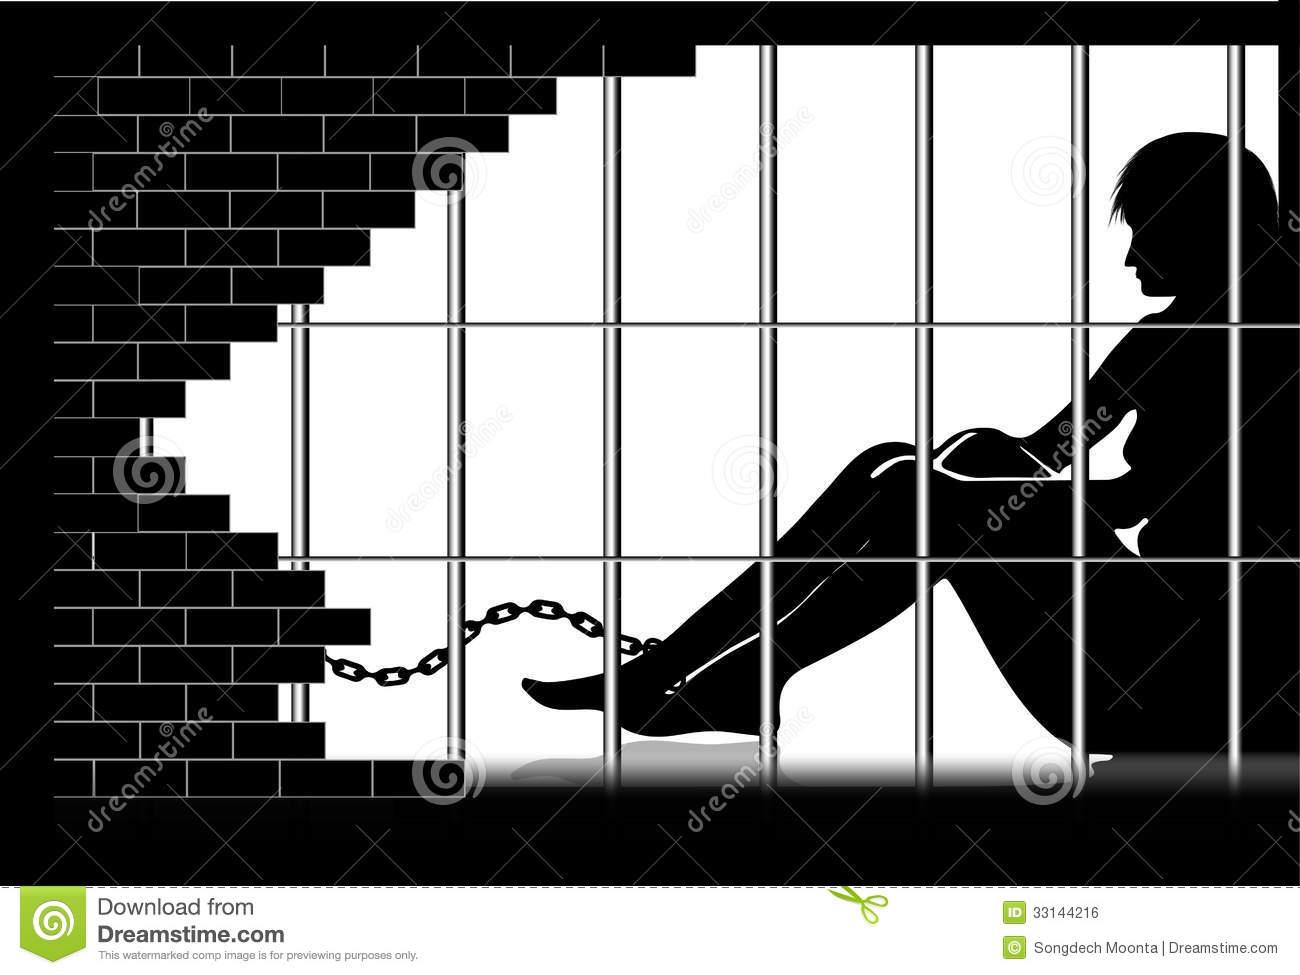 Woman behind bars clipart banner transparent stock Prisoner · Woman Behind Bars - 136*170 - Free Clipart ... banner transparent stock